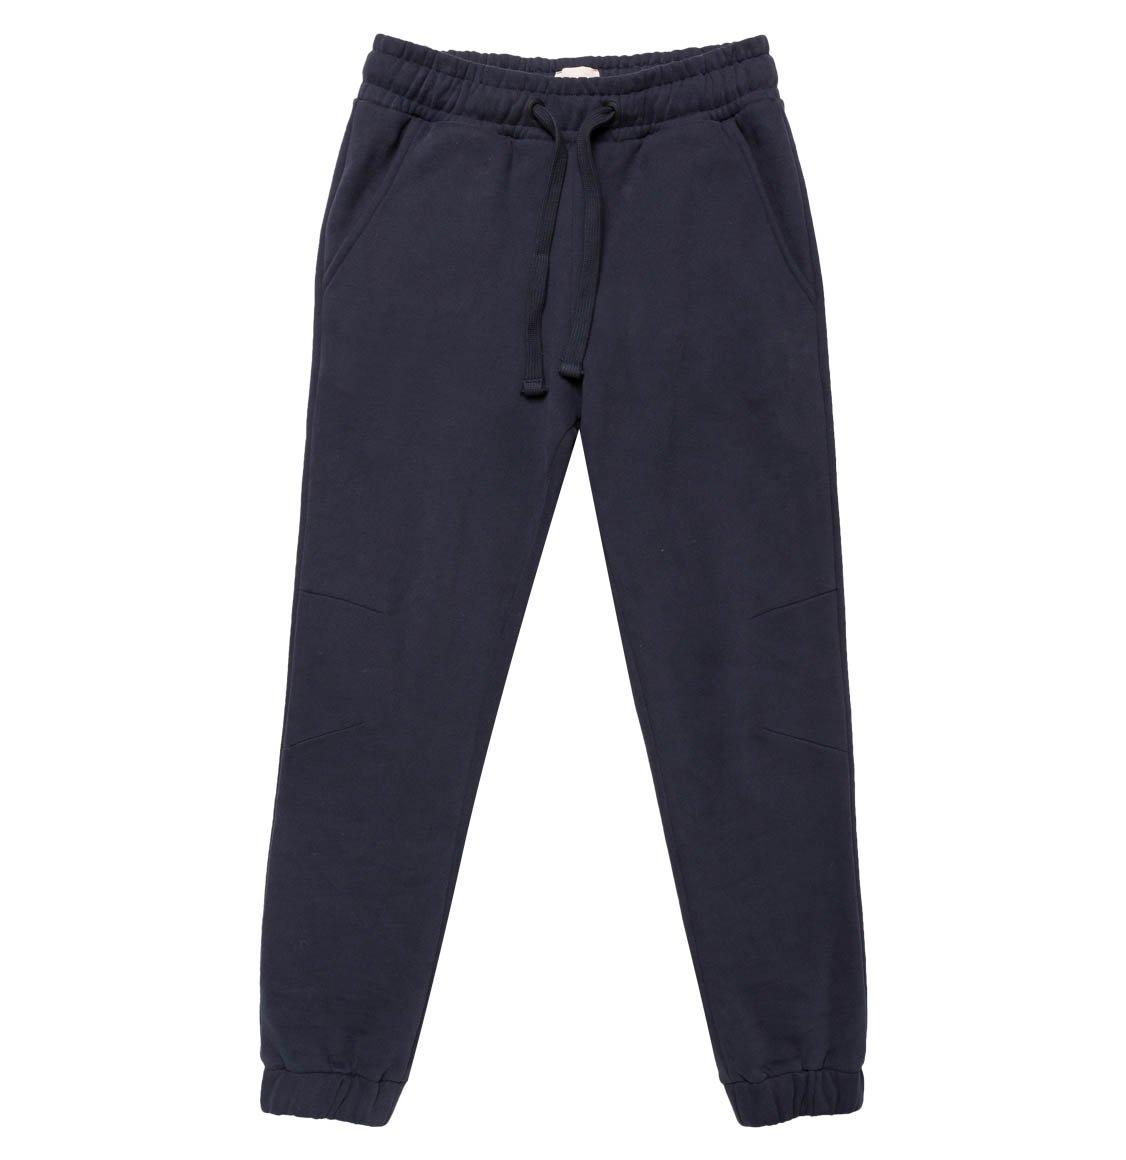 The Project Garments Regular Fit Cotton Sweatpants Navy Blue